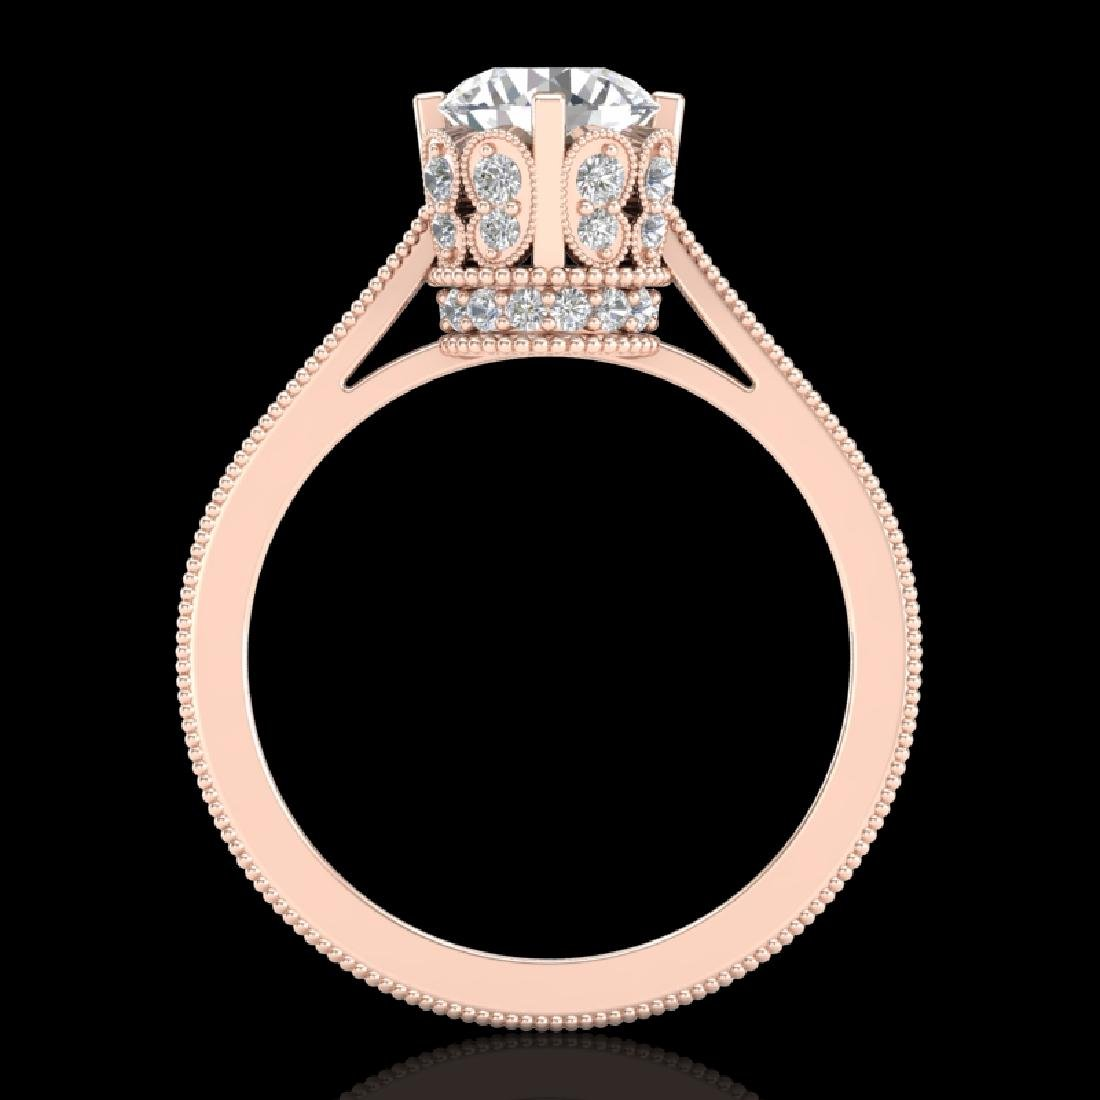 1.5 CTW VS/SI Diamond Art Deco Ring 18K Rose Gold - 3